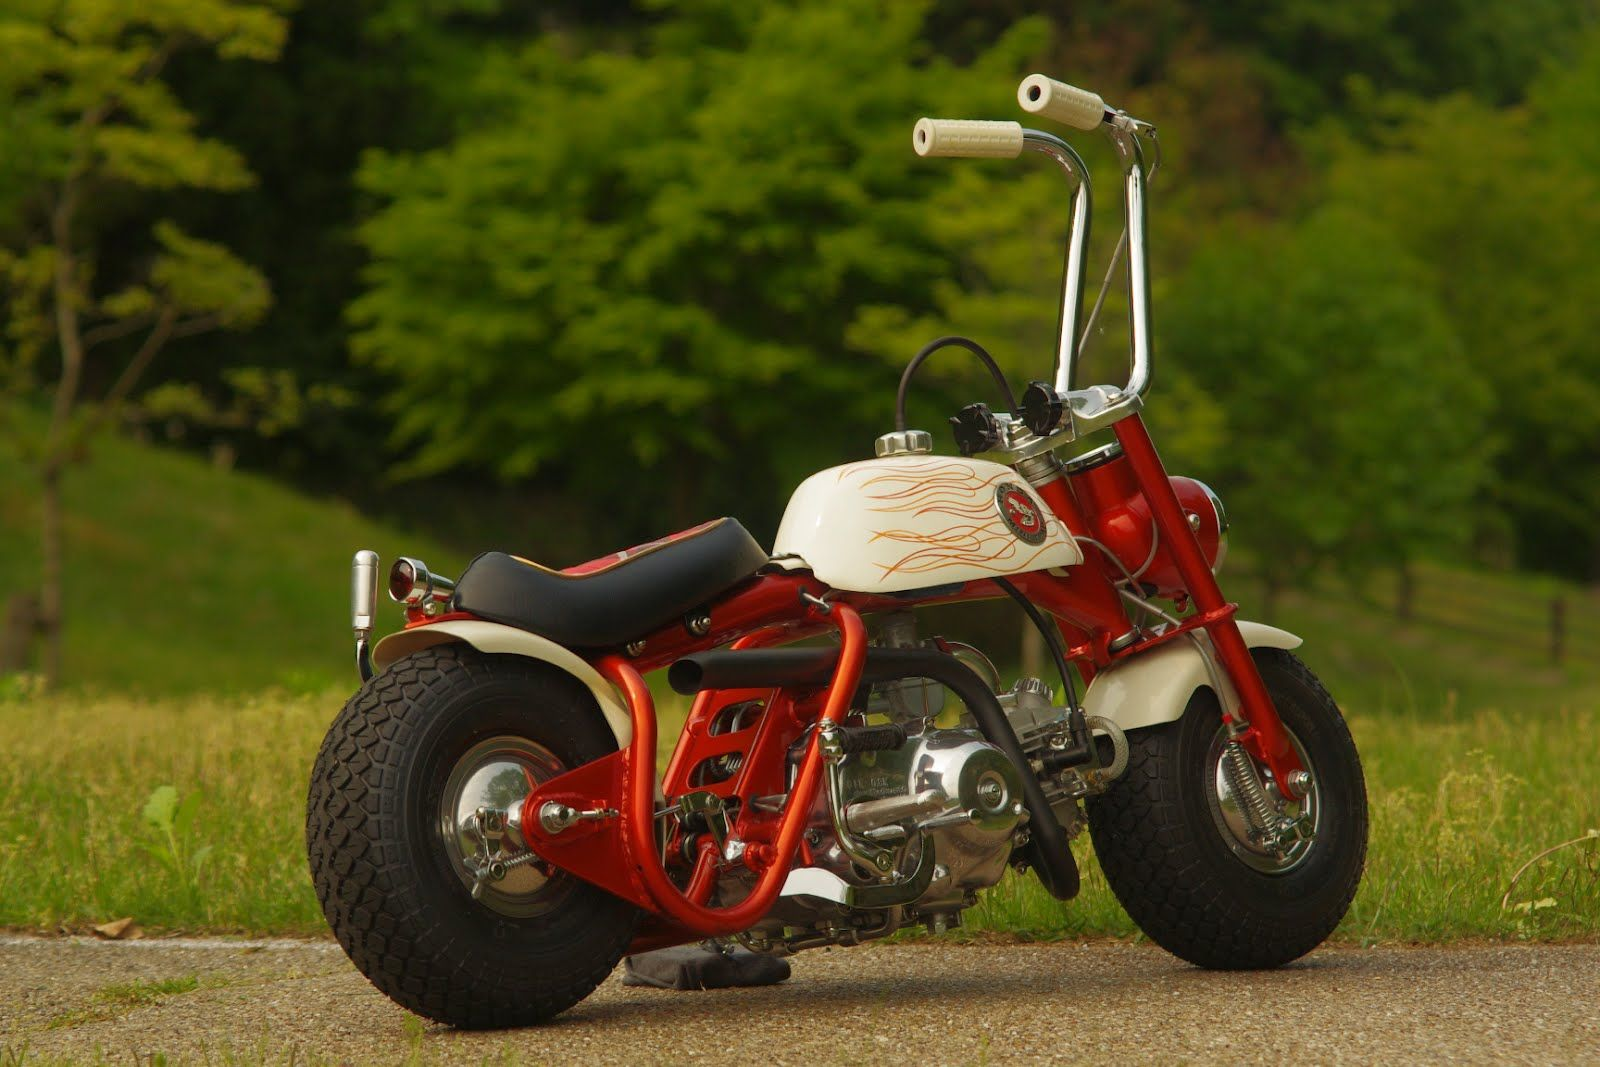 honda mini trail bikes motorcycles scooter bmx. Black Bedroom Furniture Sets. Home Design Ideas